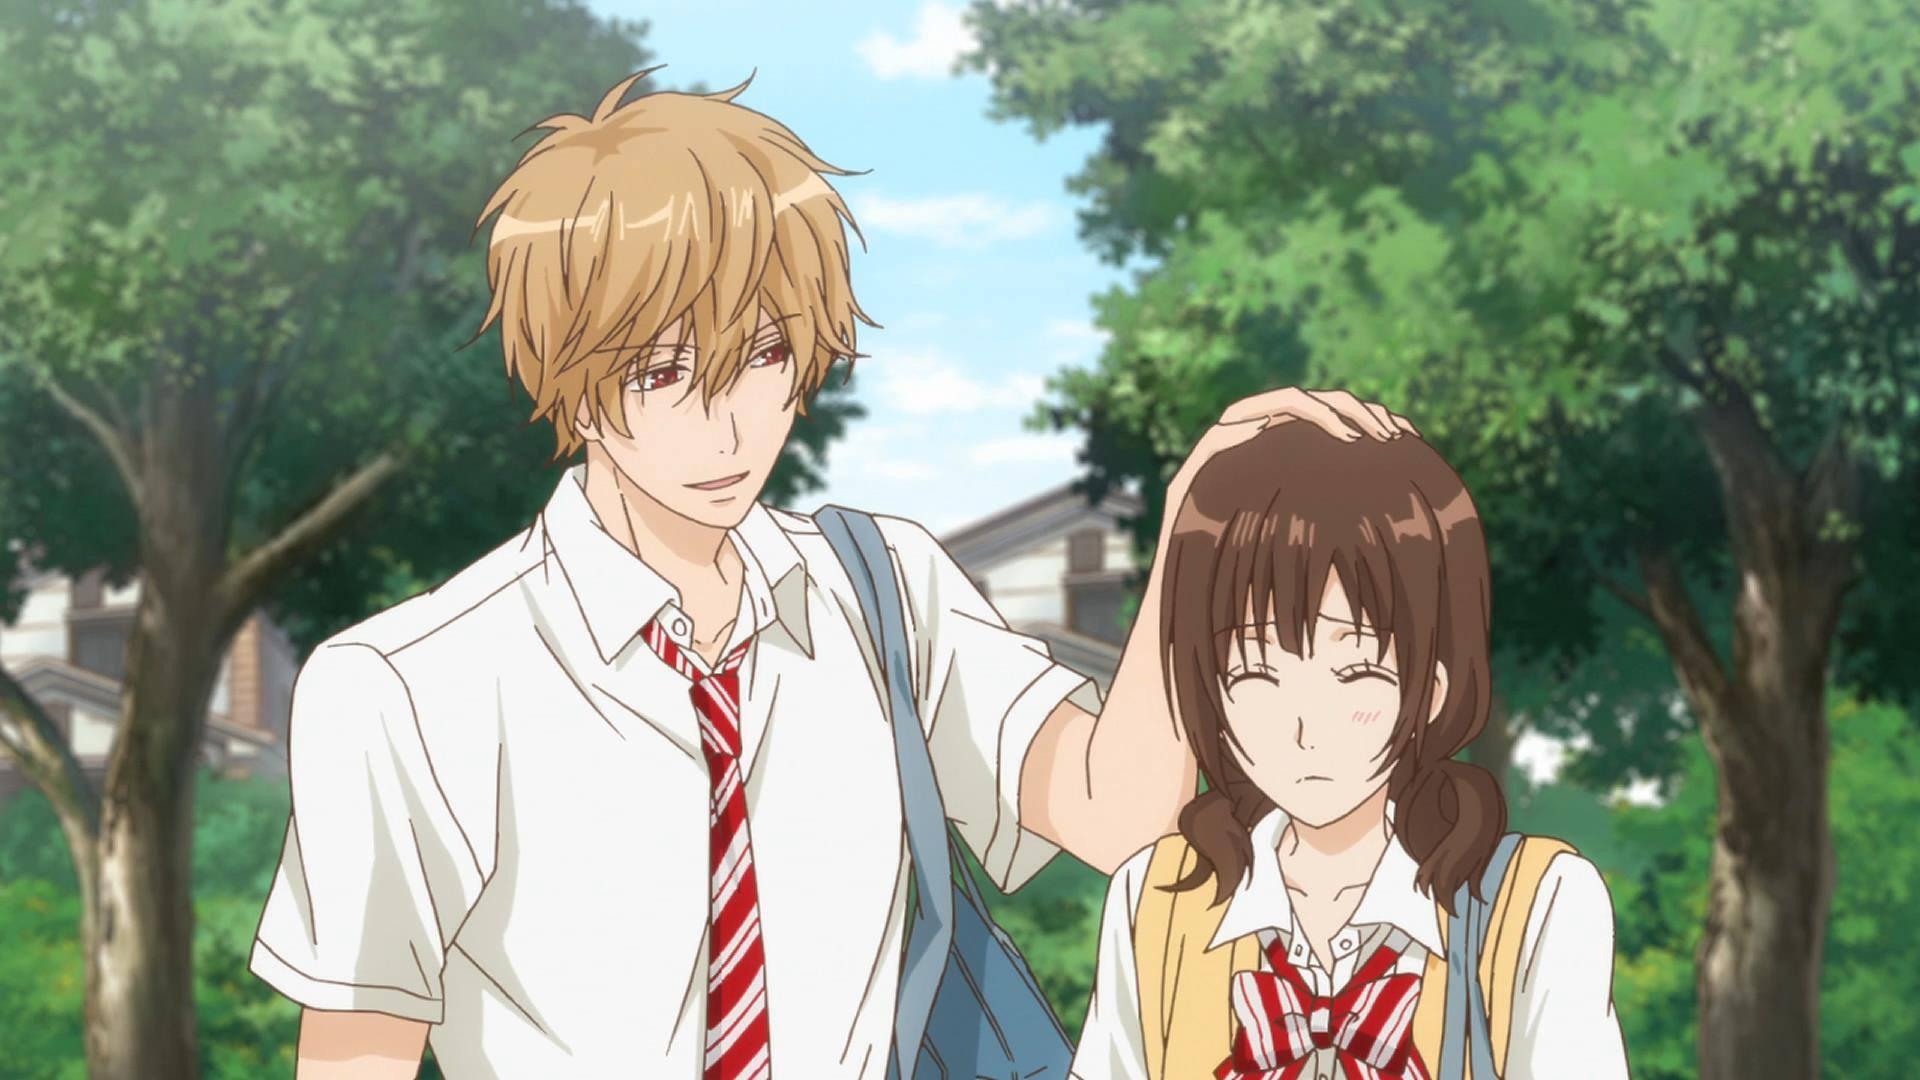 wallpaper  anime screenshot mangaka wolf girl and